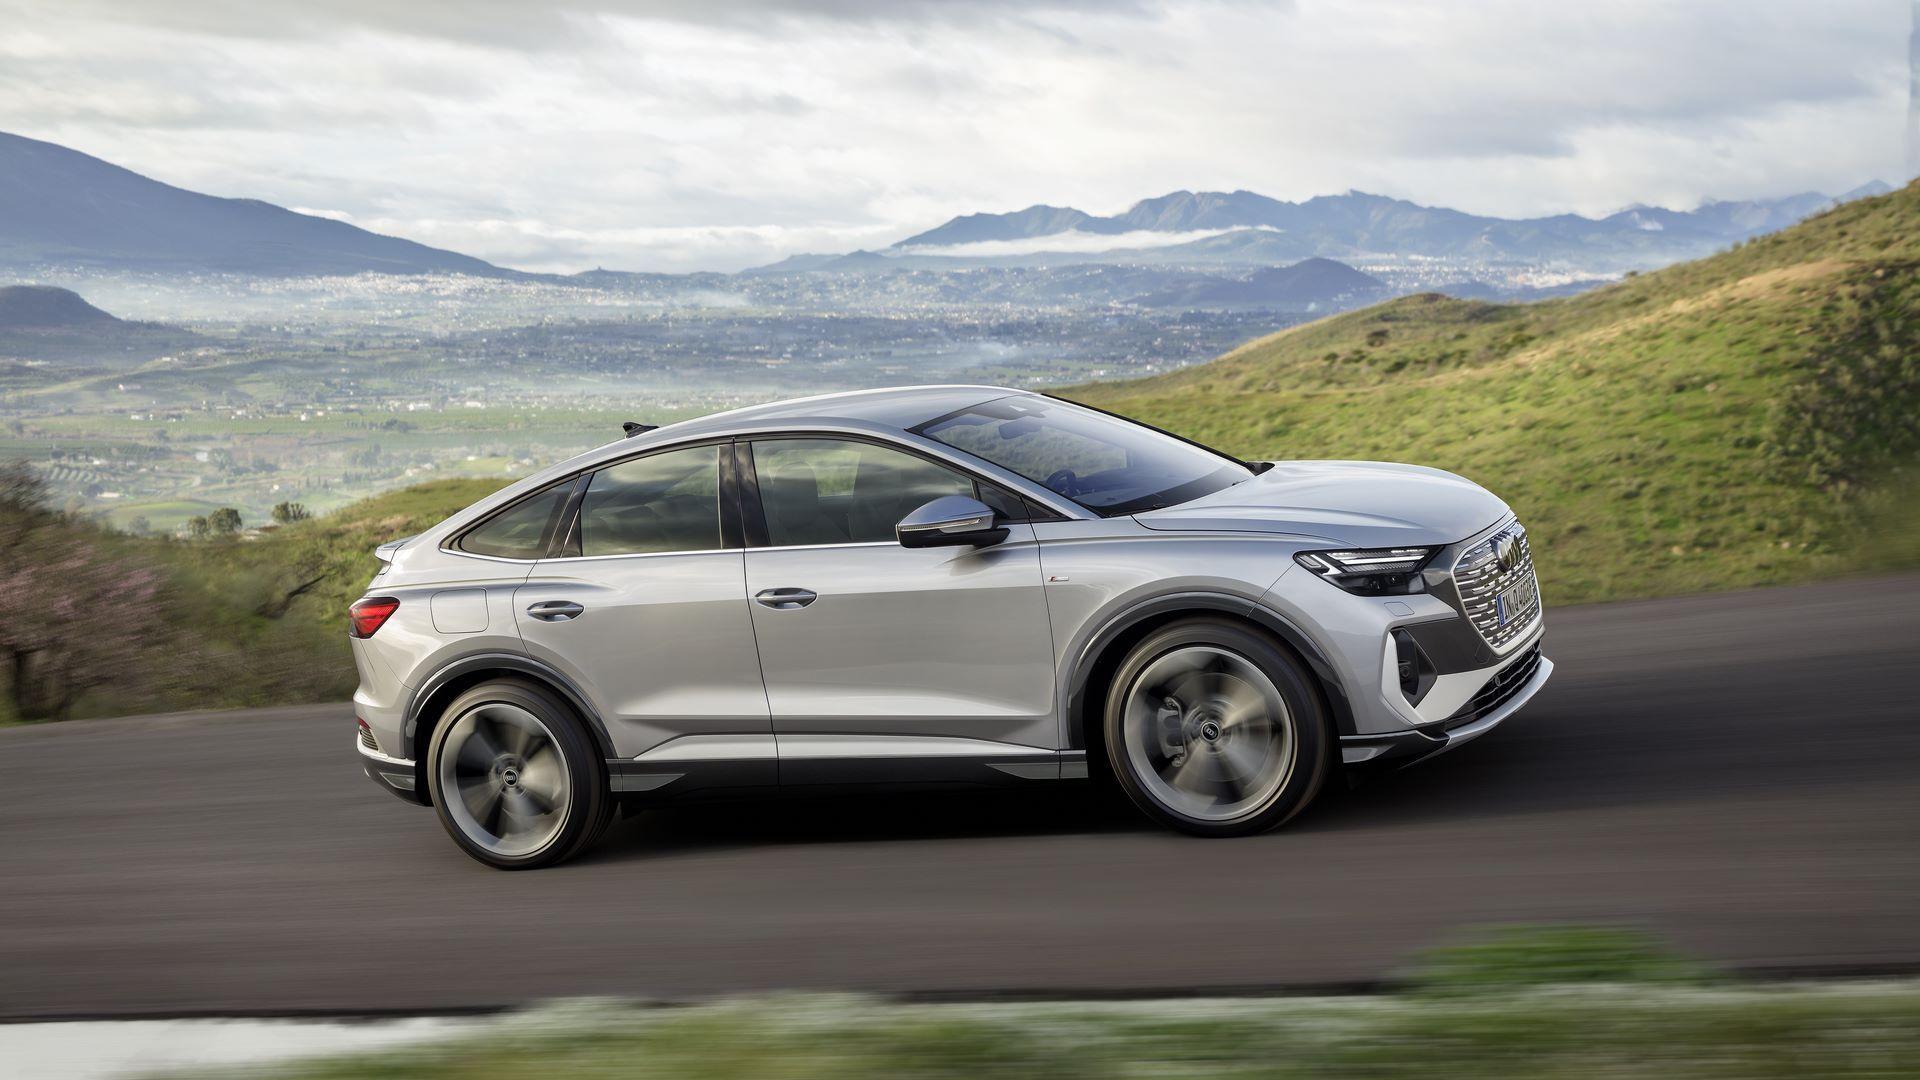 Audi-Q4-e-tron-and-Q4-e-tron-Sportback-39